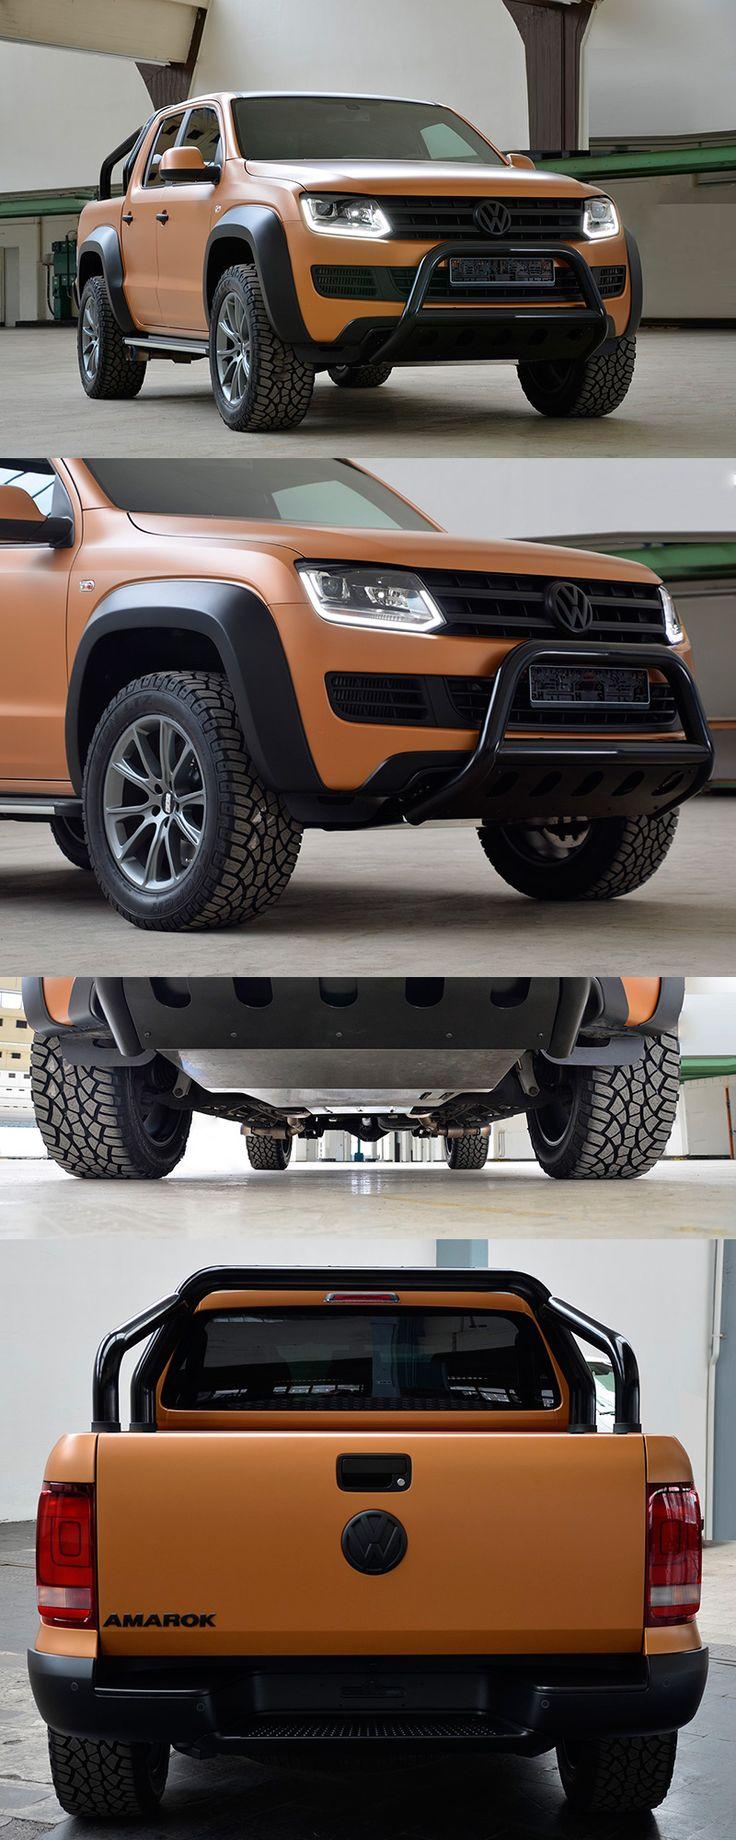 VW Amarok by MTM https://www.amazon.co.uk/Baby-Car-Mirror-Shatterproof-Installation/dp/B06XHG6SSY/ref=sr_1_2?ie=UTF8&qid=1499074433&sr=8-2&keywords=Kingseye